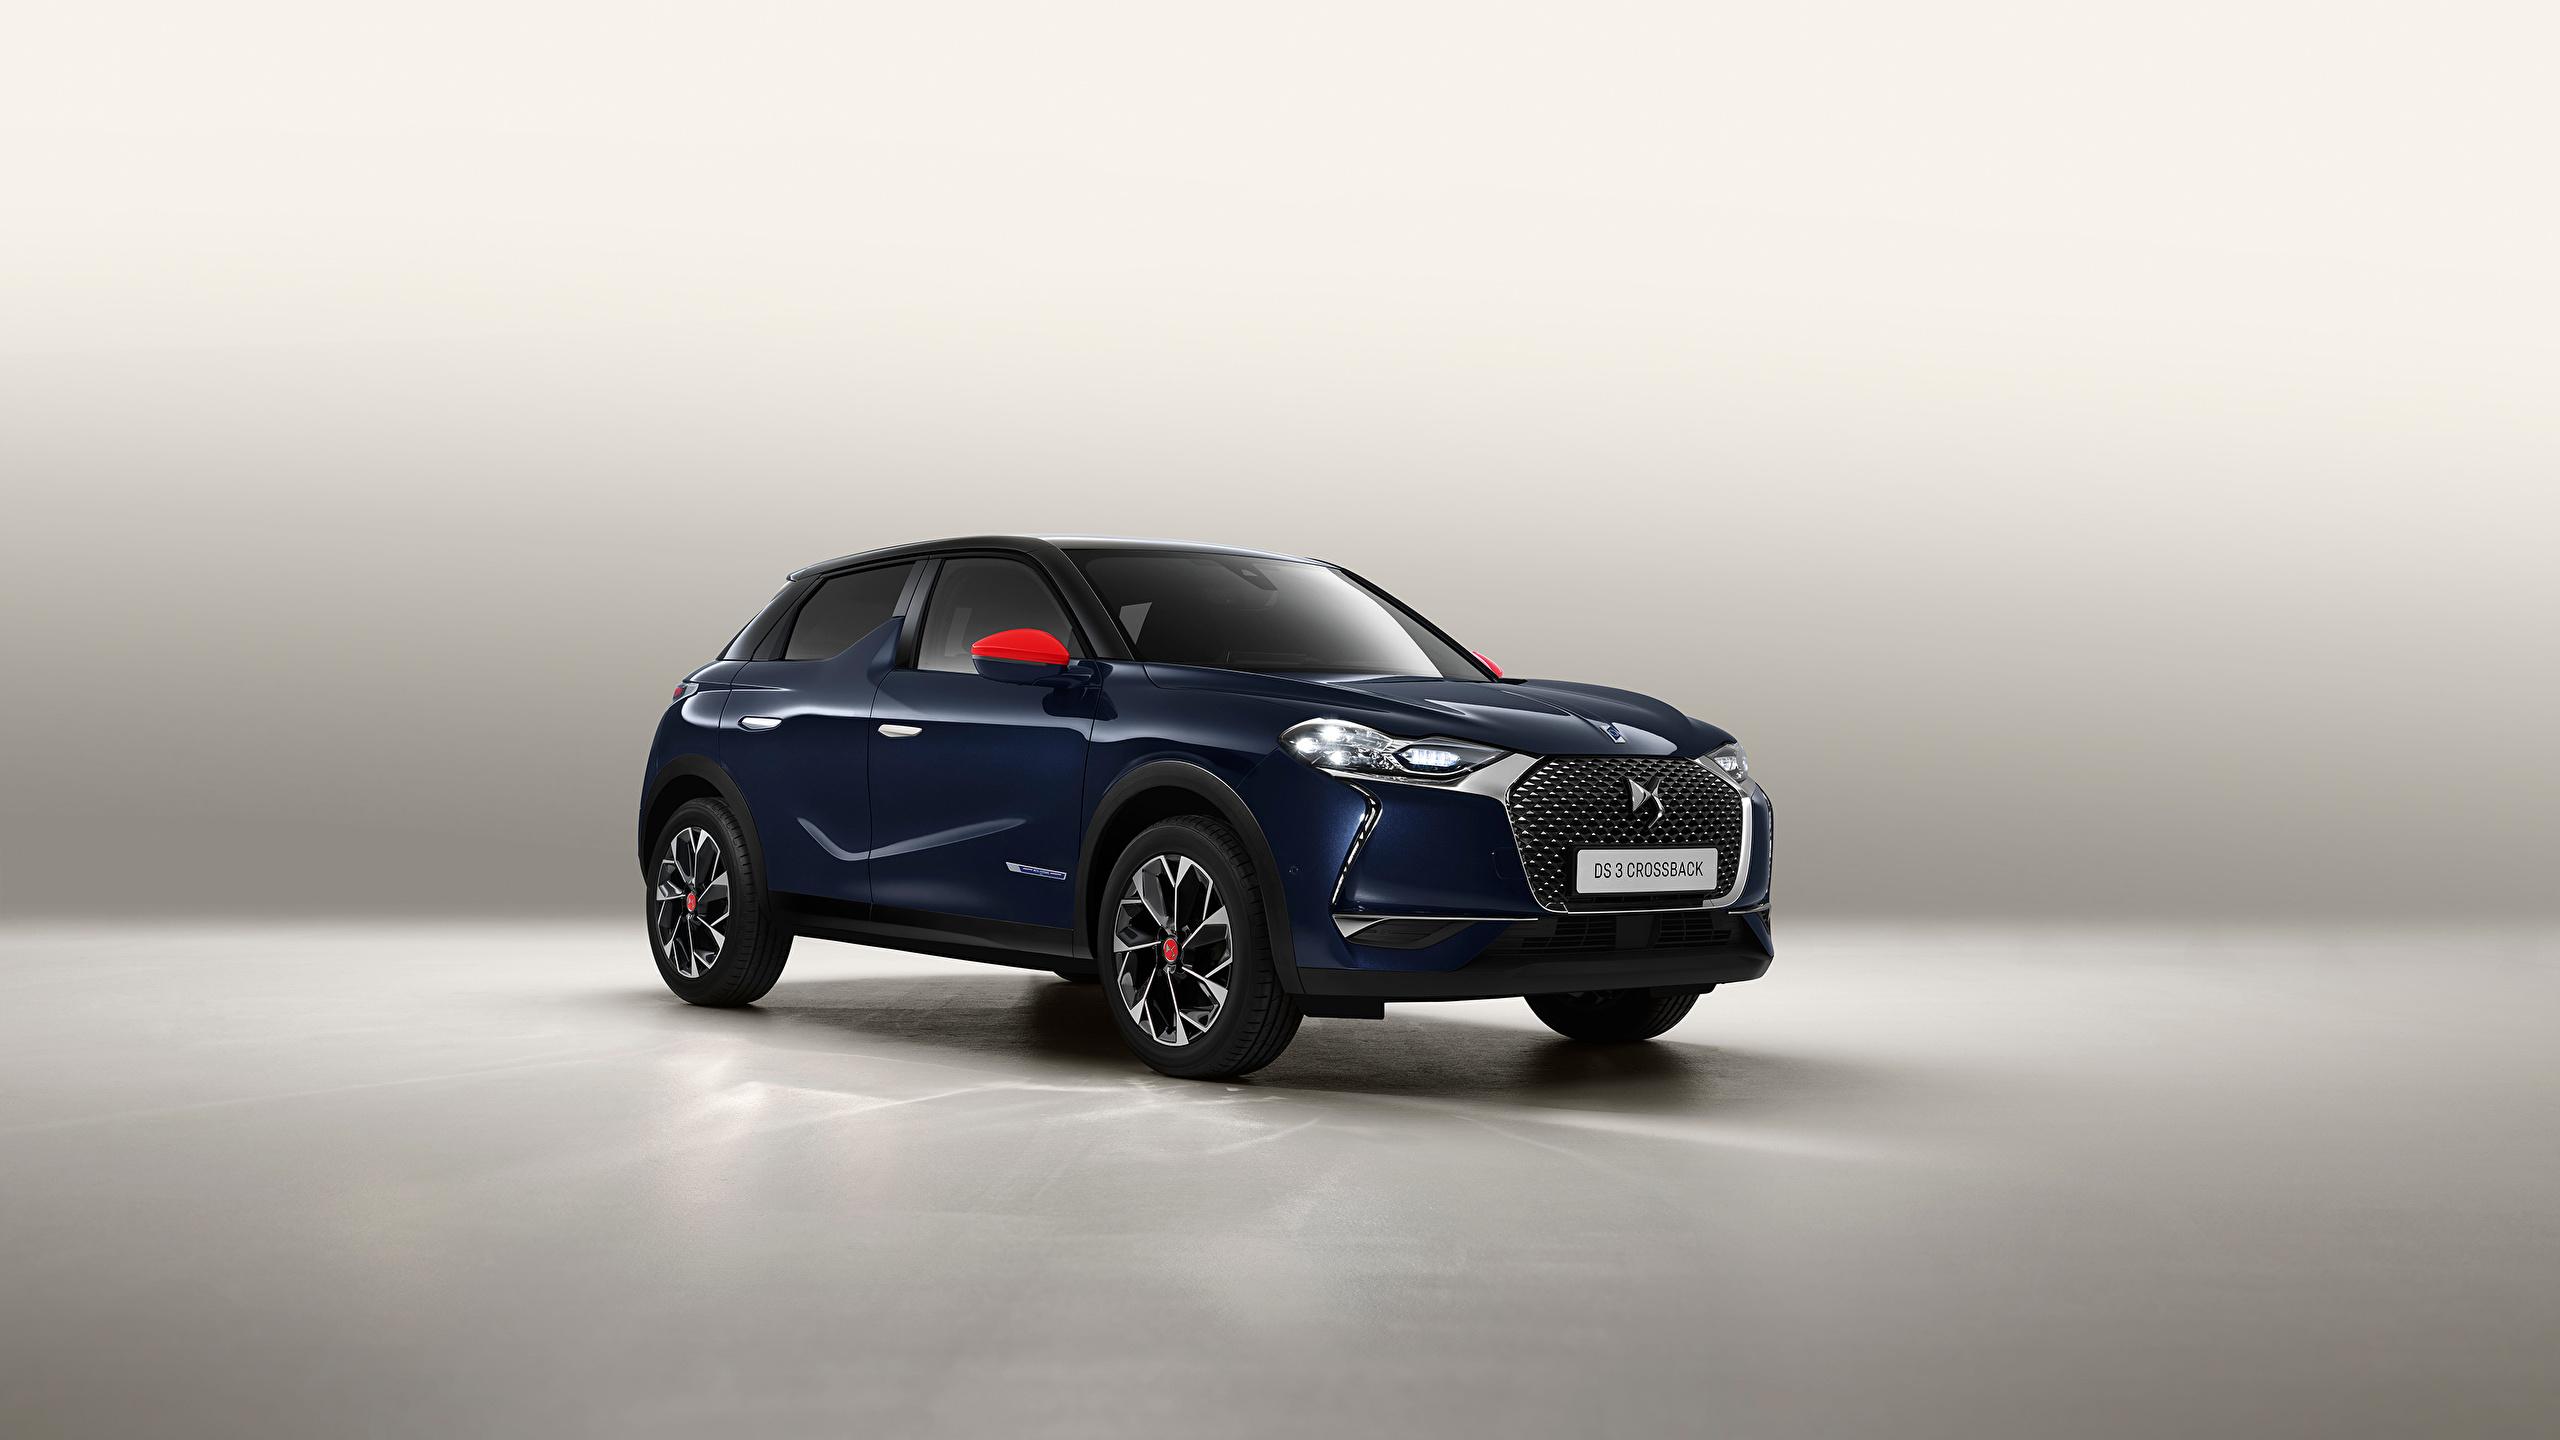 Fotos Französischer Crossover DS 3 Crossback, 2020 Blau auto Metallisch 2560x1440 französische französisches Softroader Autos automobil